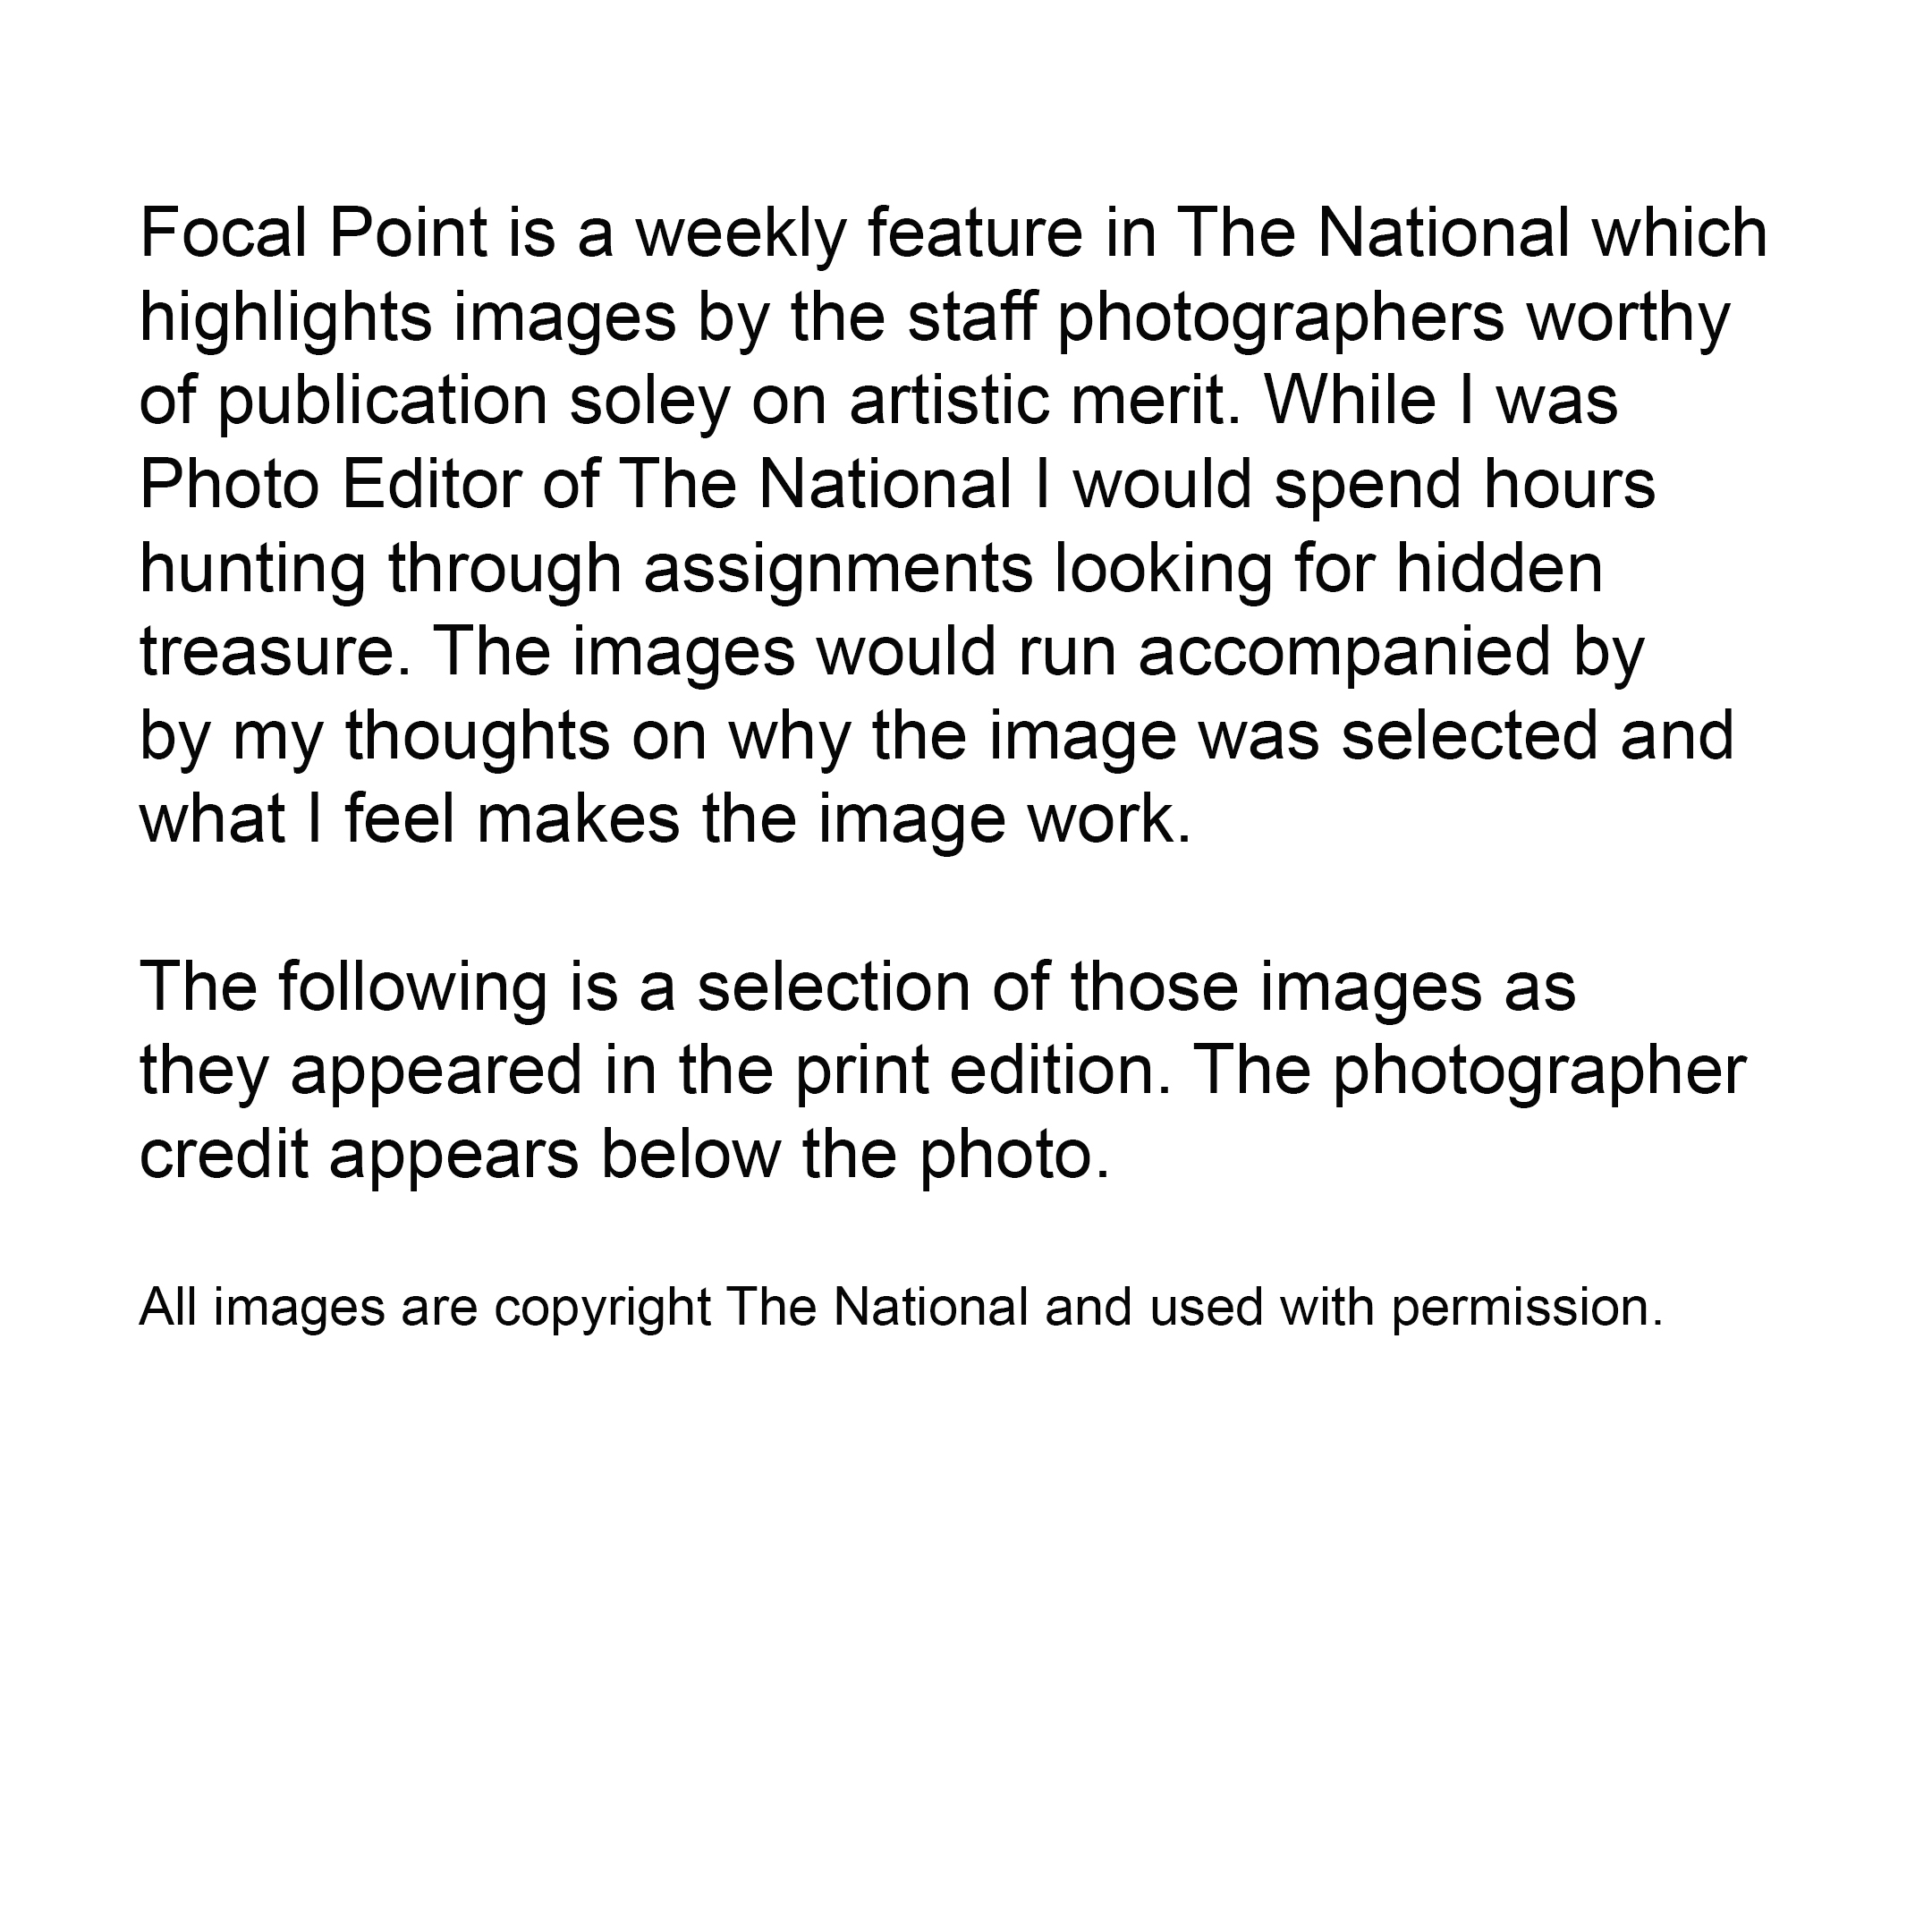 FocalPointExplained02.jpg